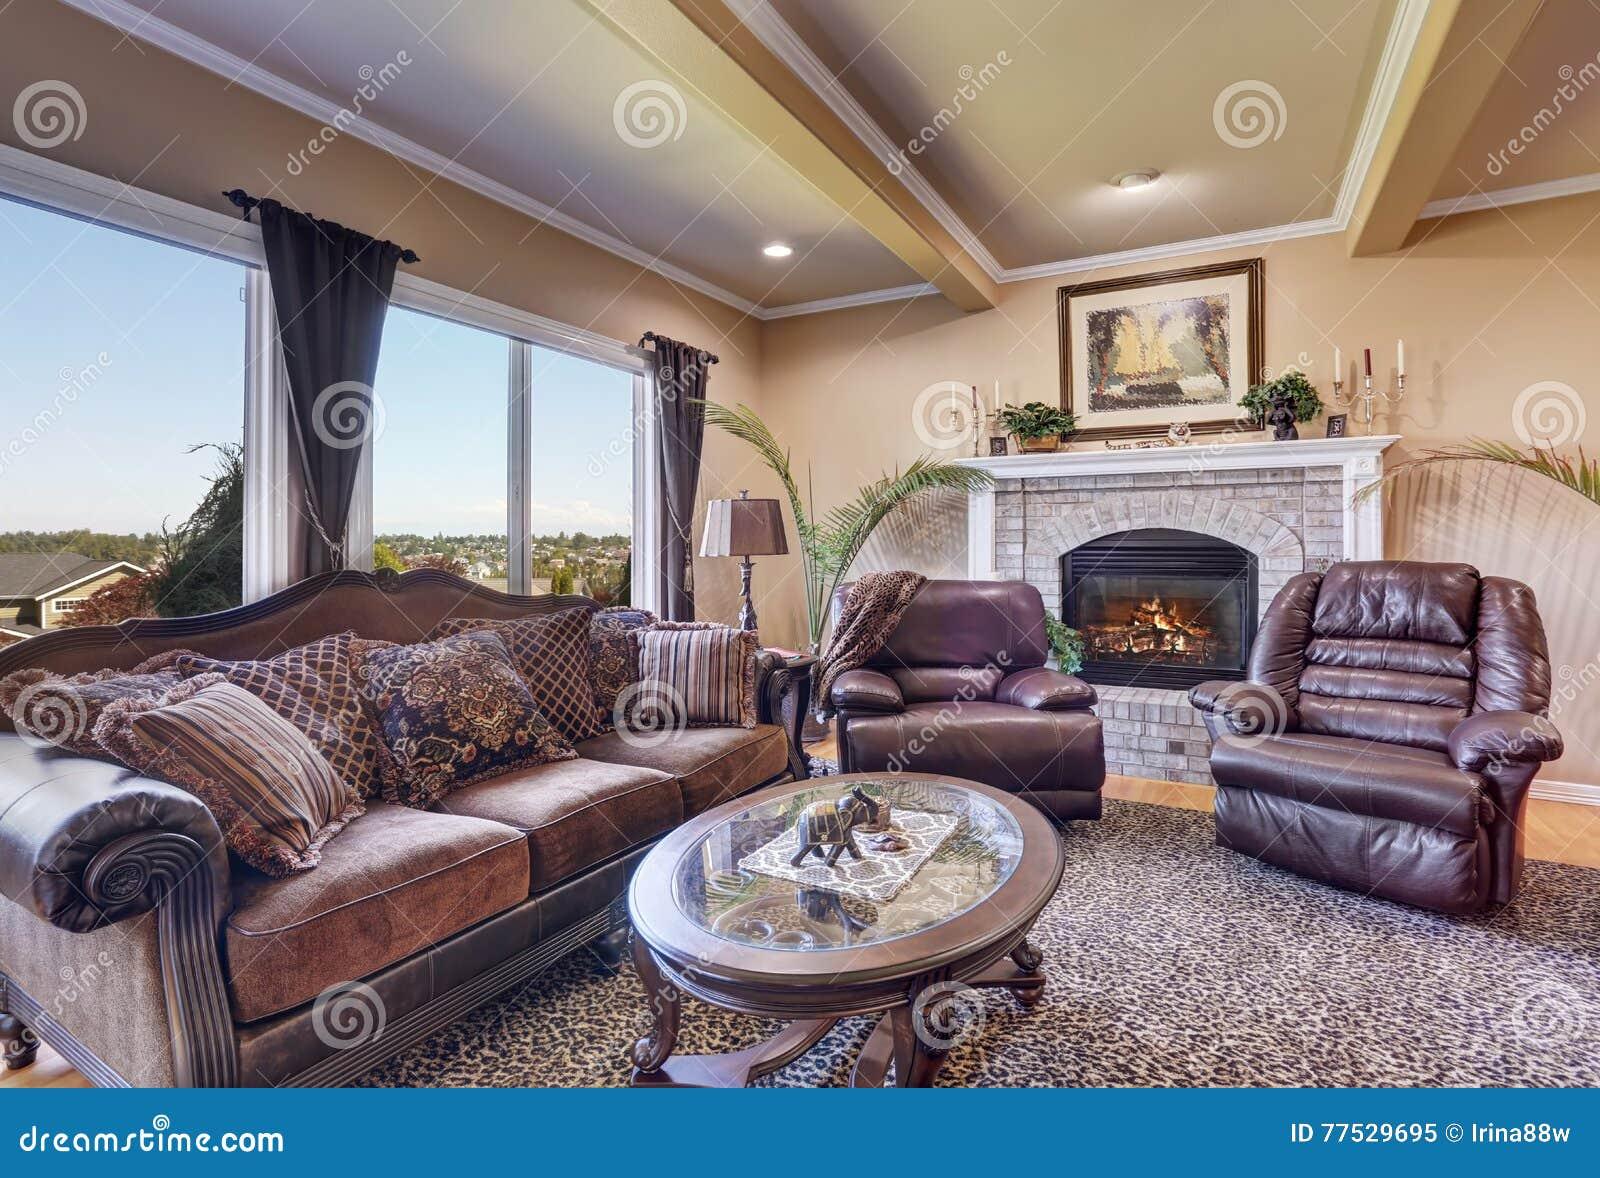 Luxury Living Room With Elegant Vintage Furniture Stock